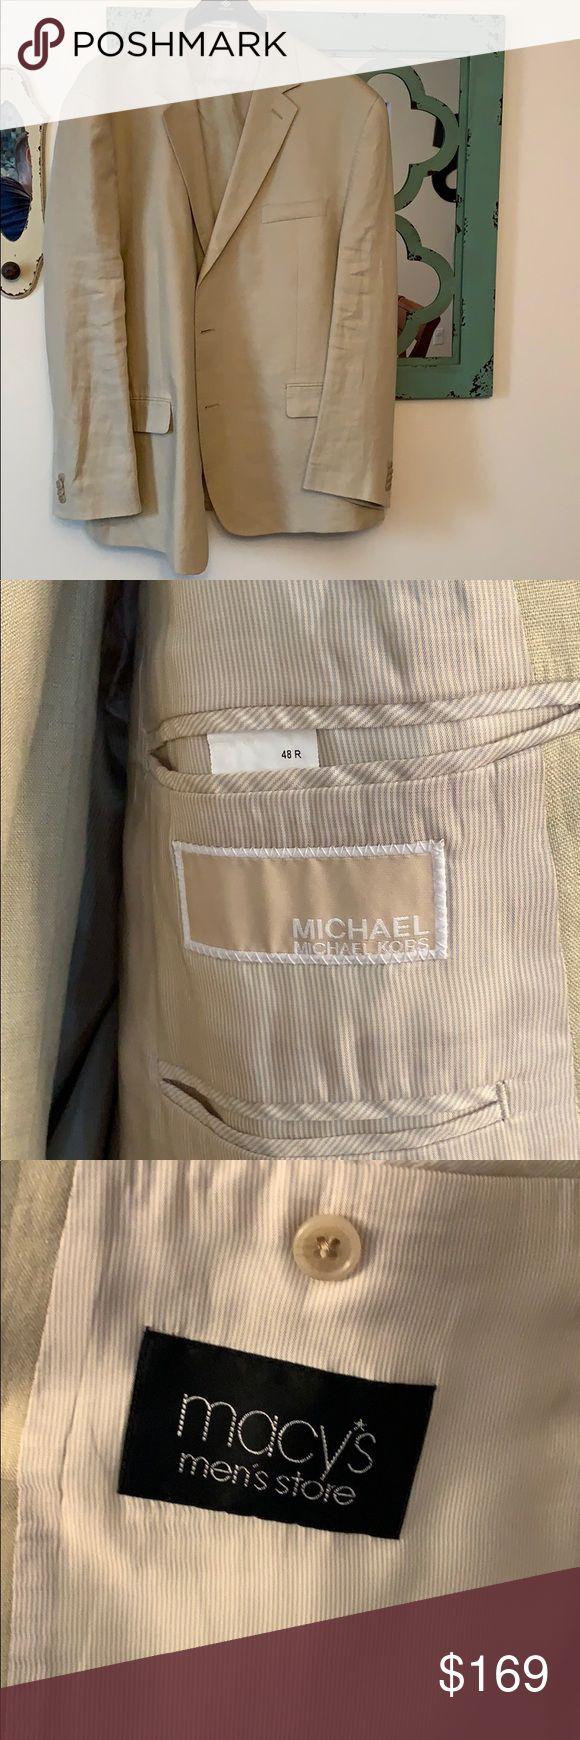 Michael Kor's men's Linen Two Piece Suit Michael Kors Men's Two Piece Line…